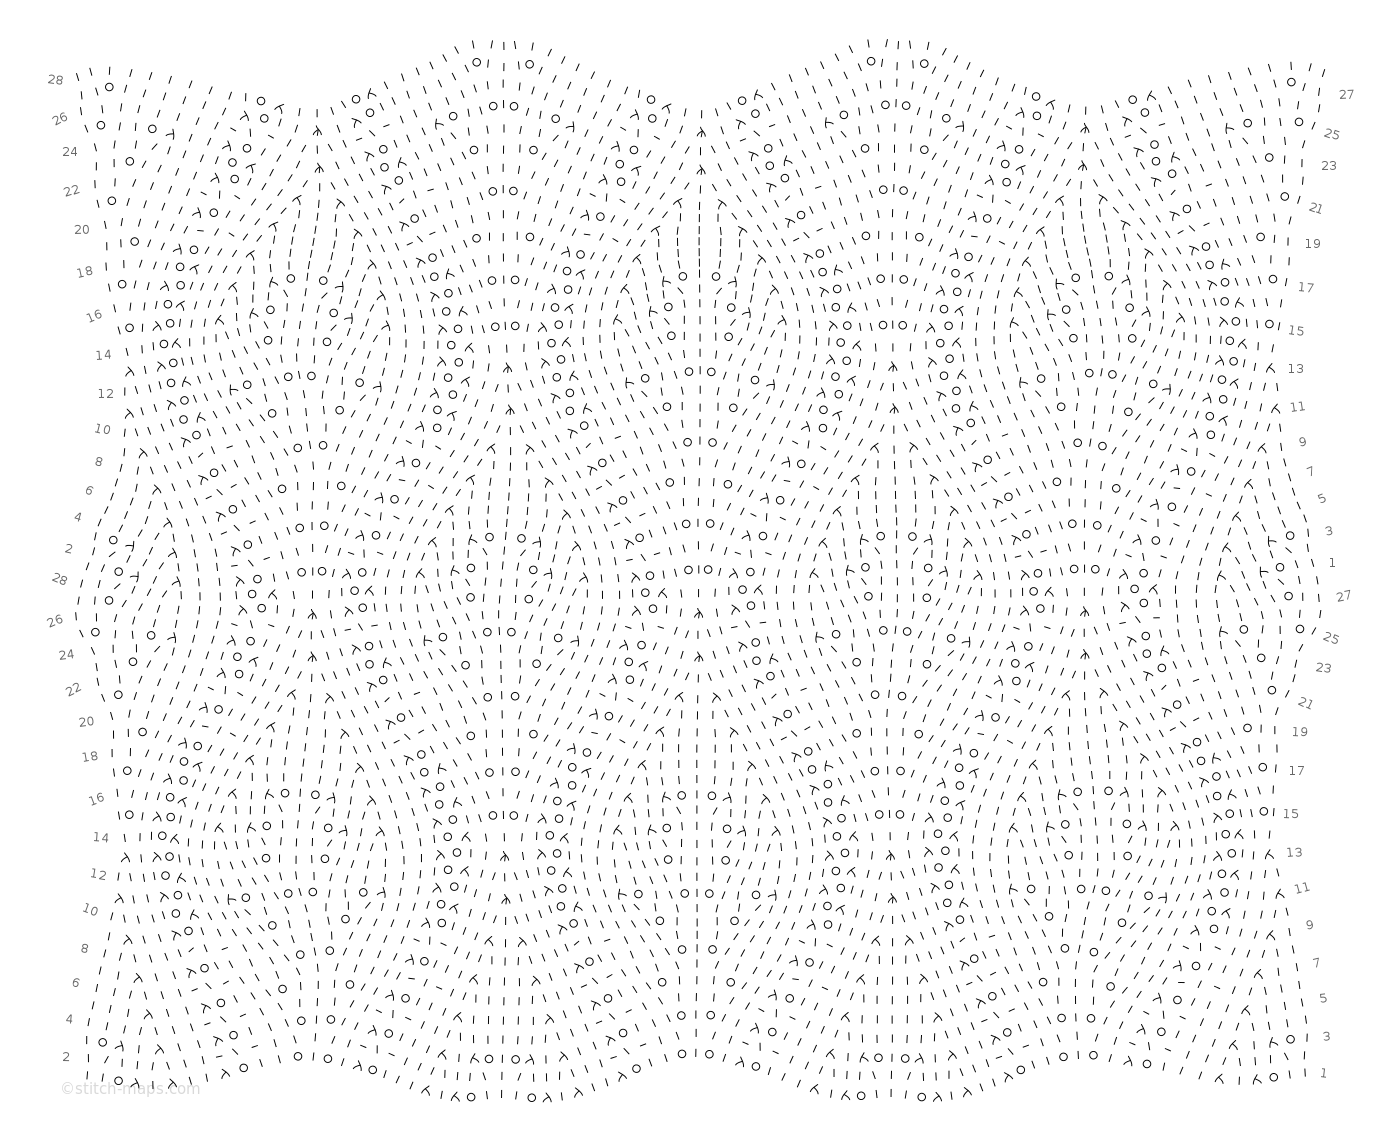 Ogee Lace Rib chart